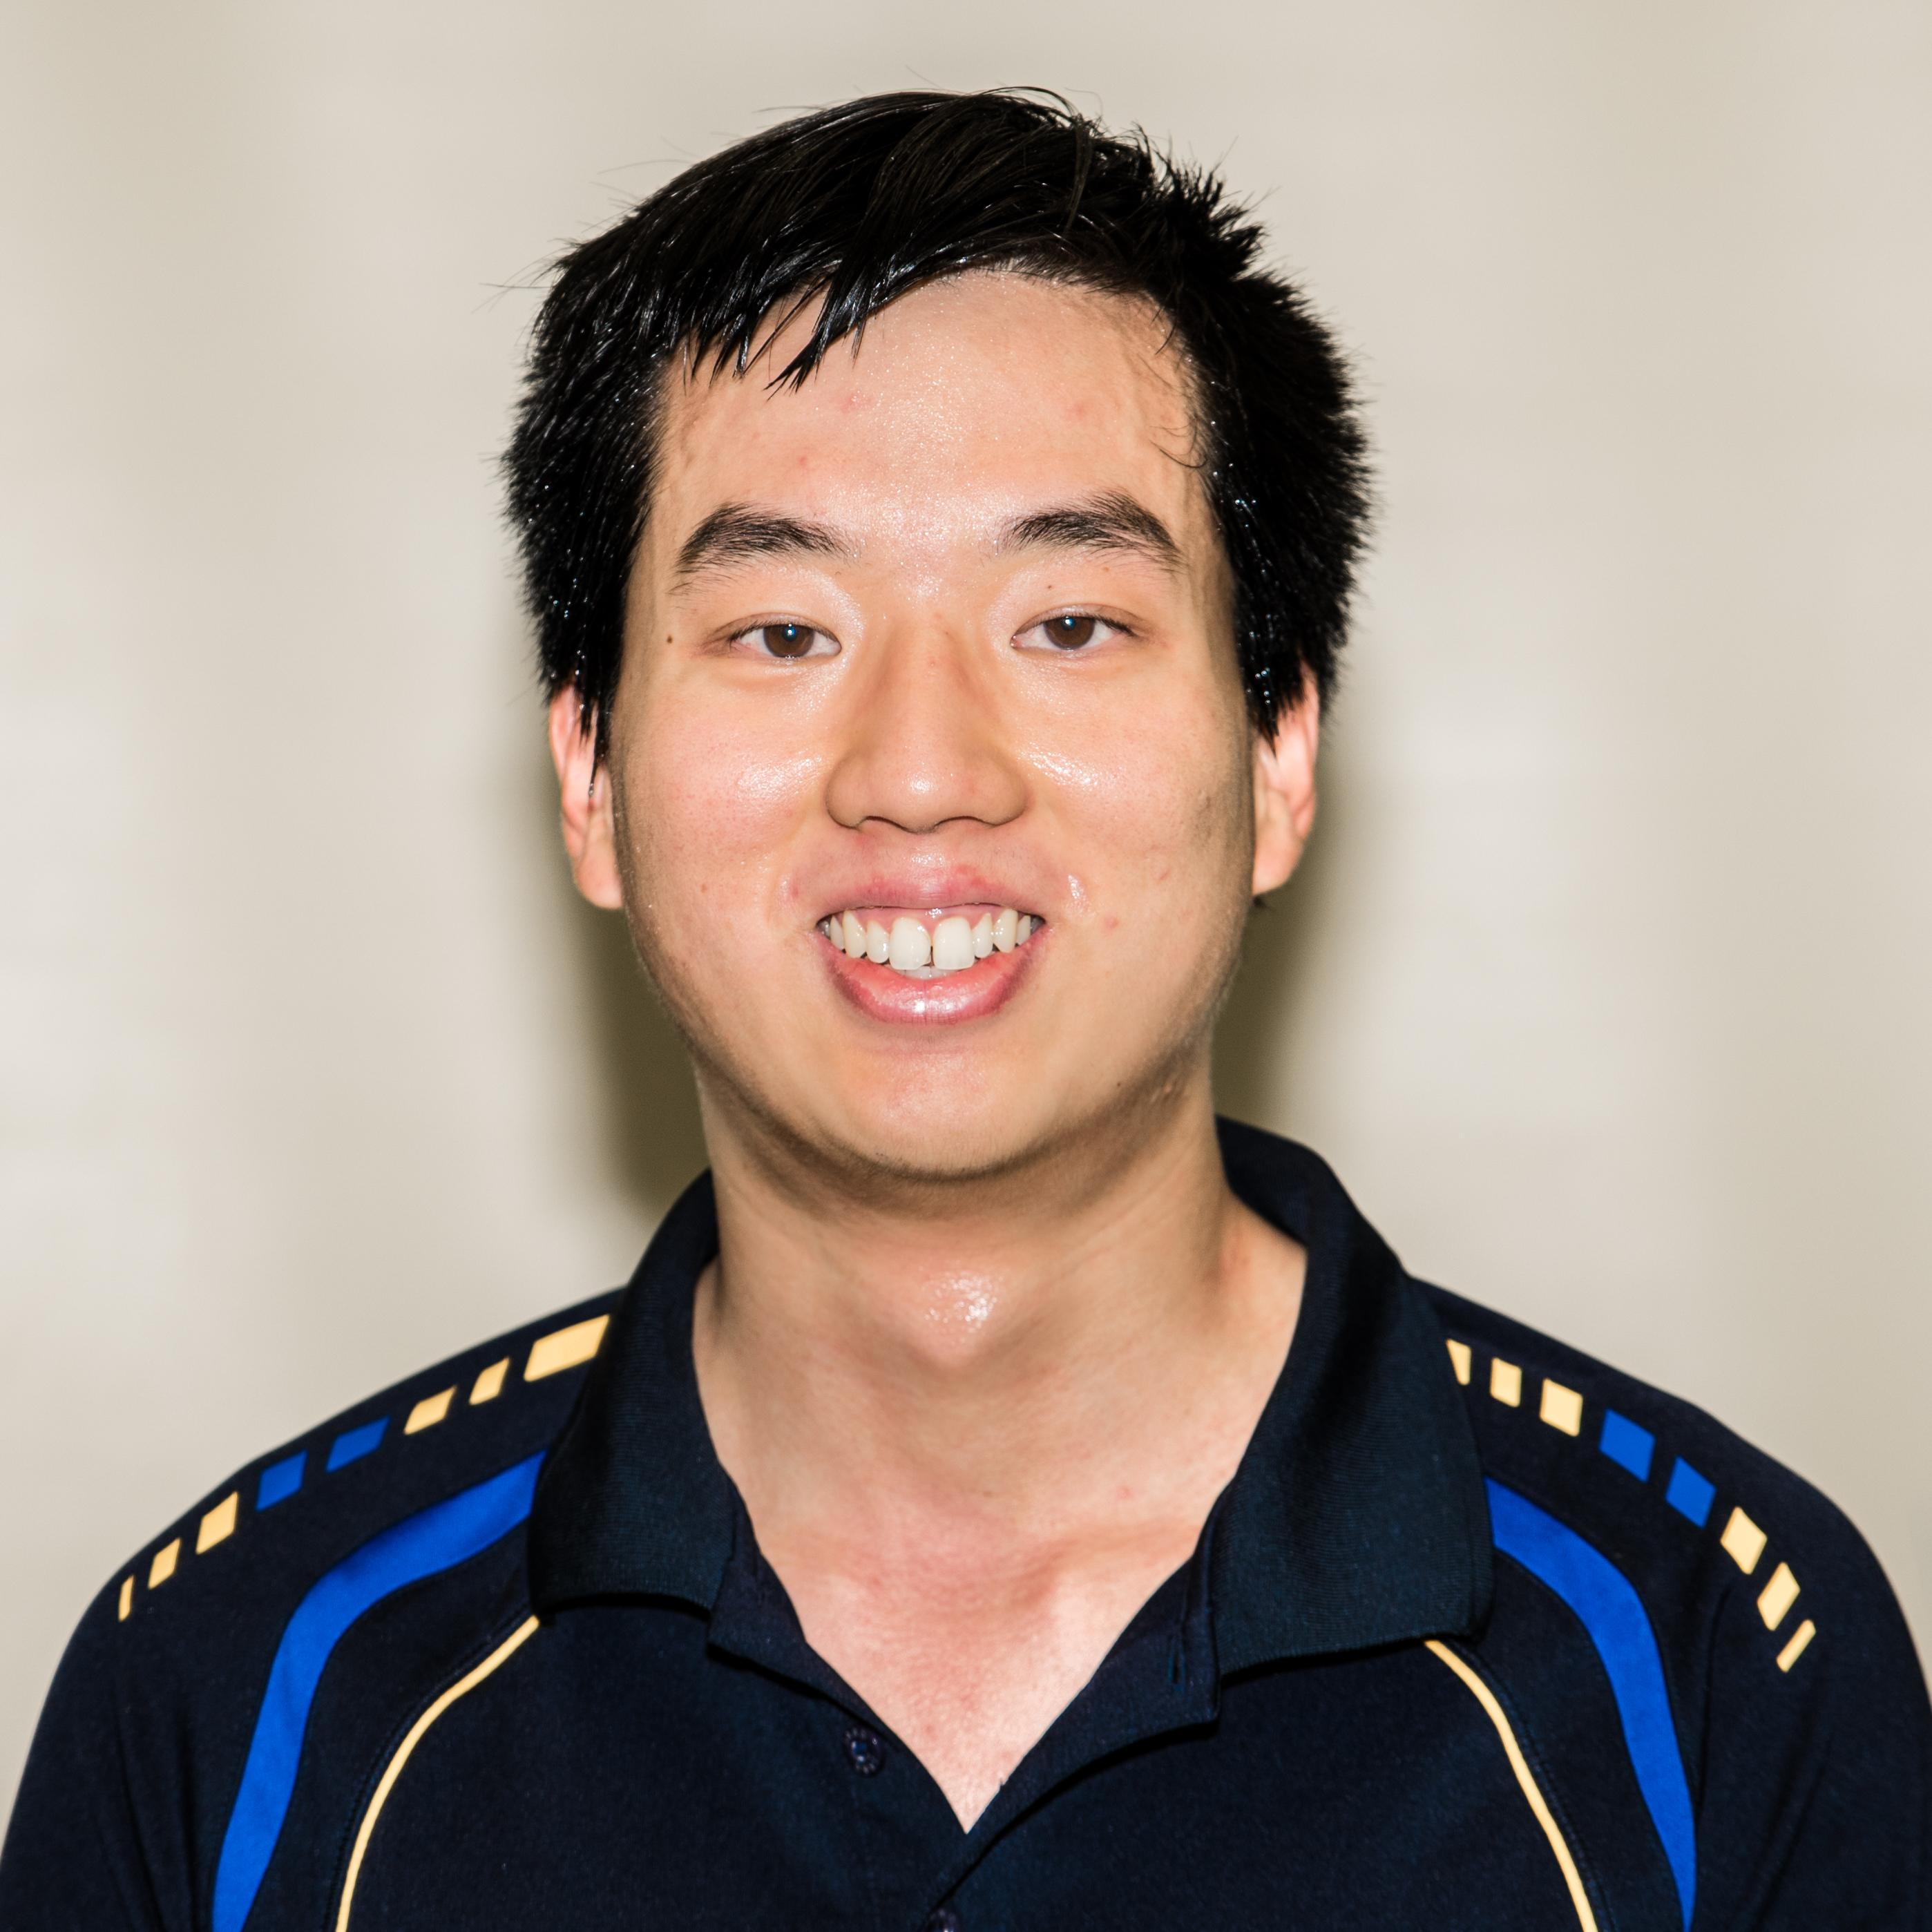 Soung Lim